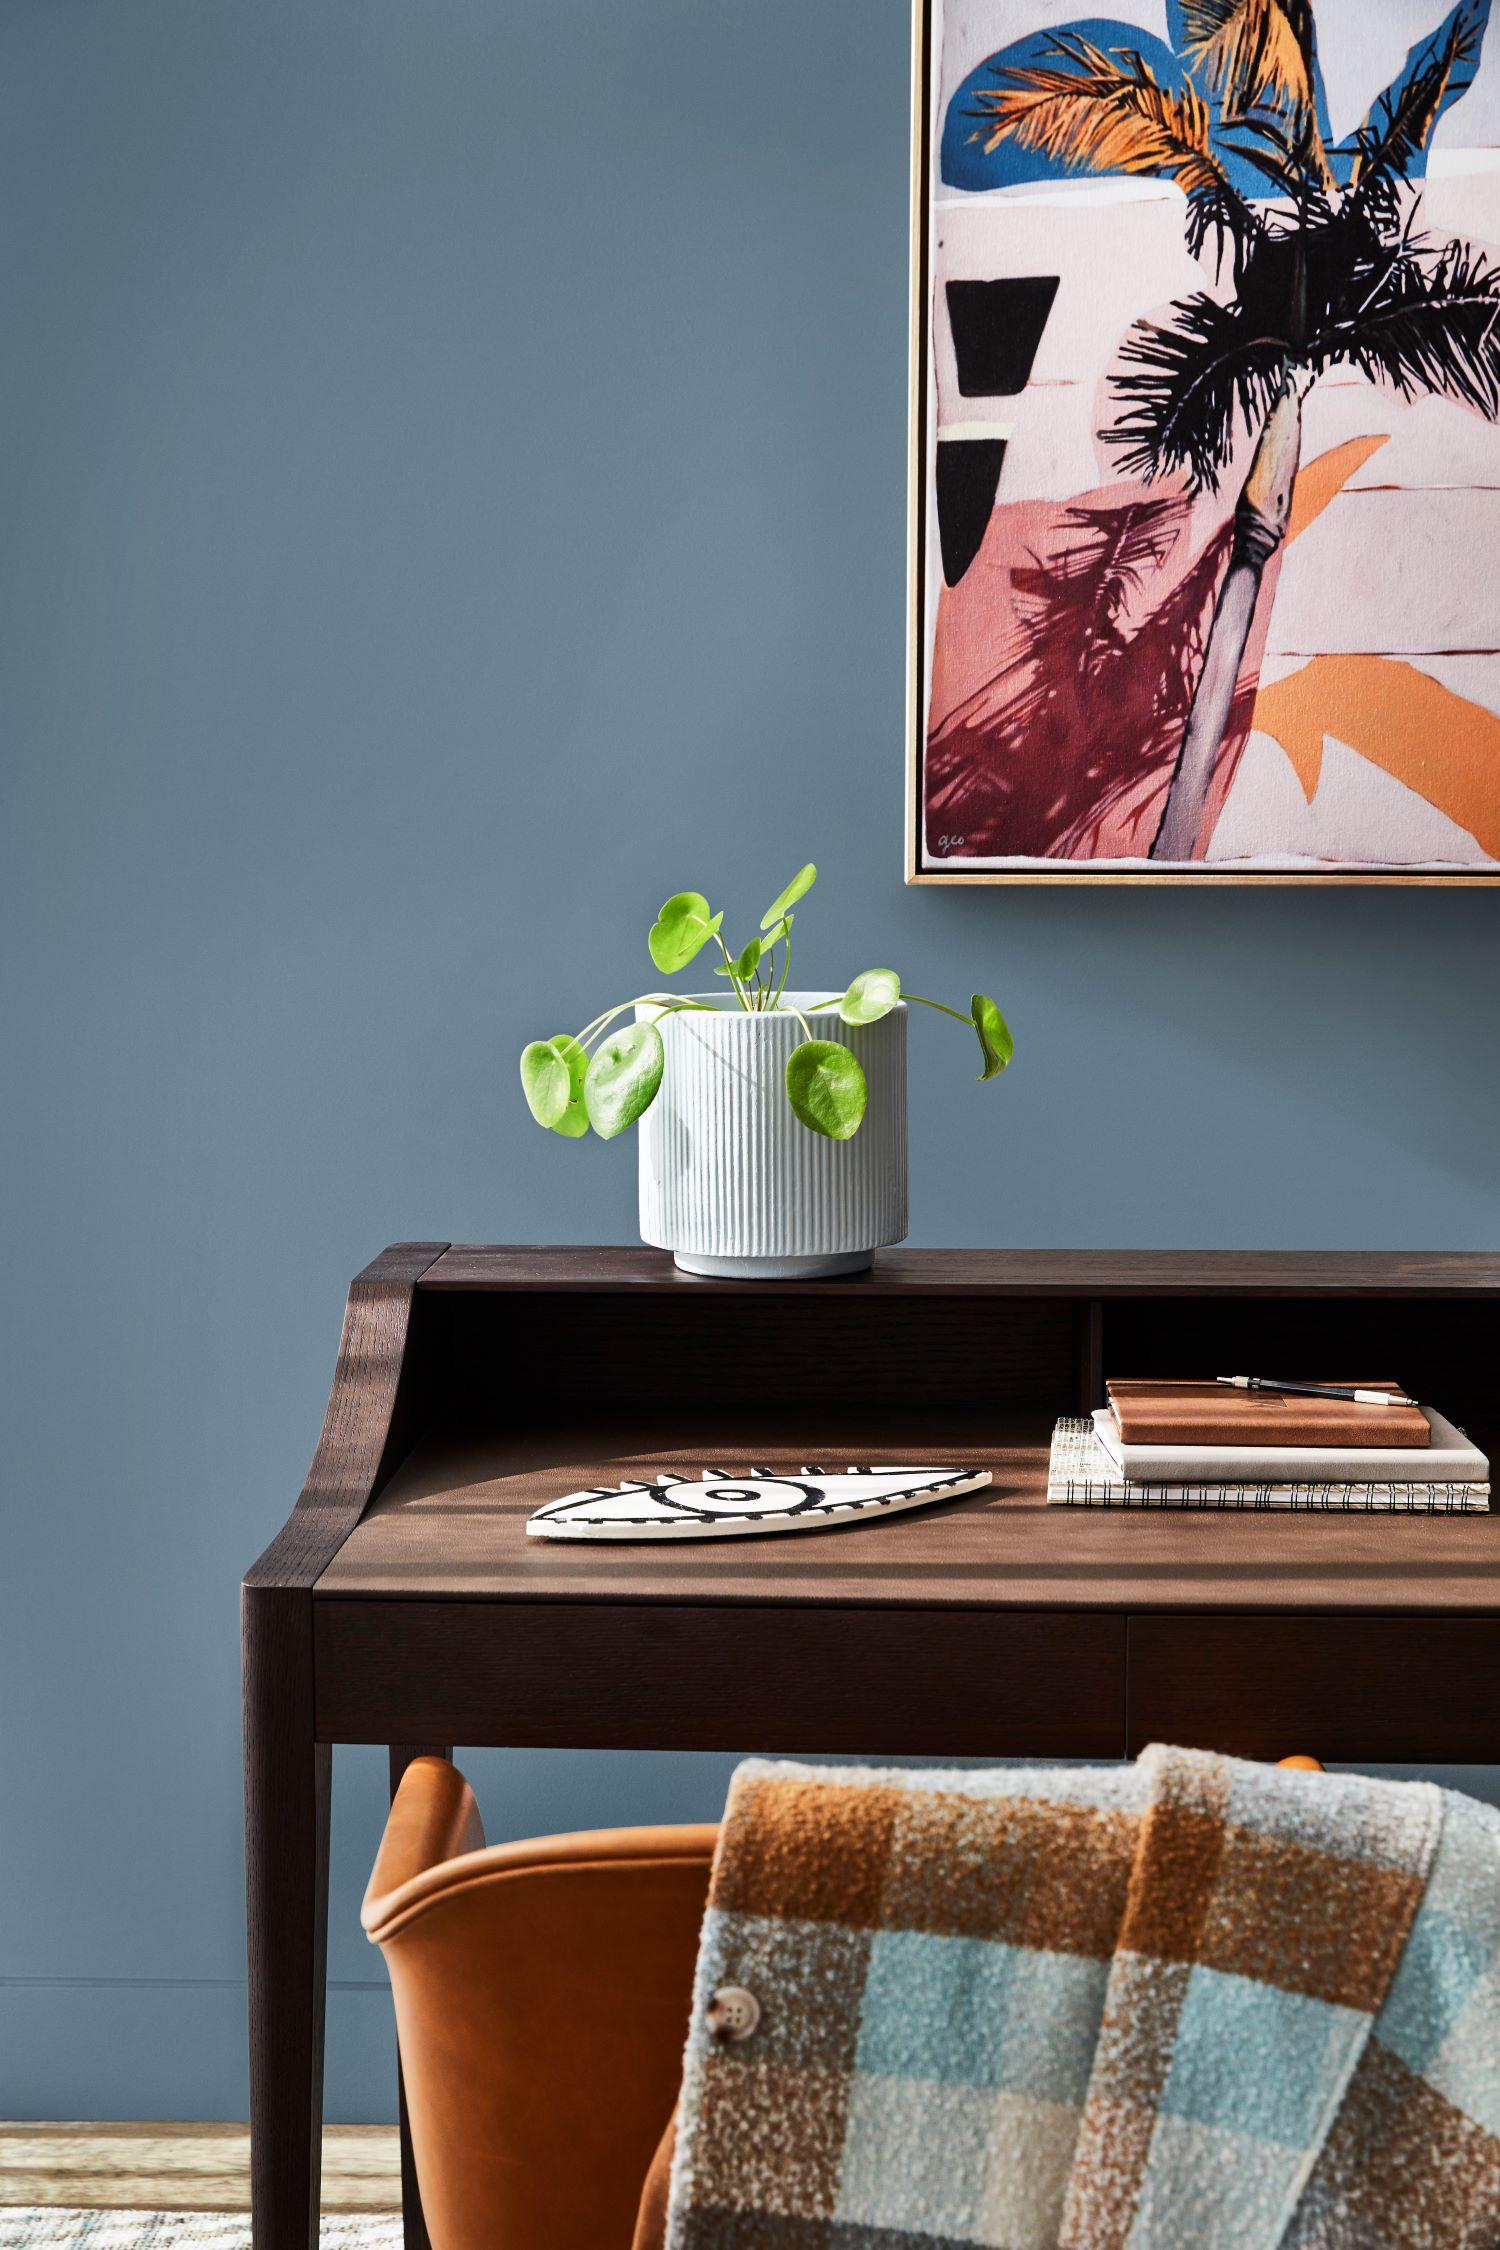 dulux-study-styling-julia-green-retreat-colour-palette